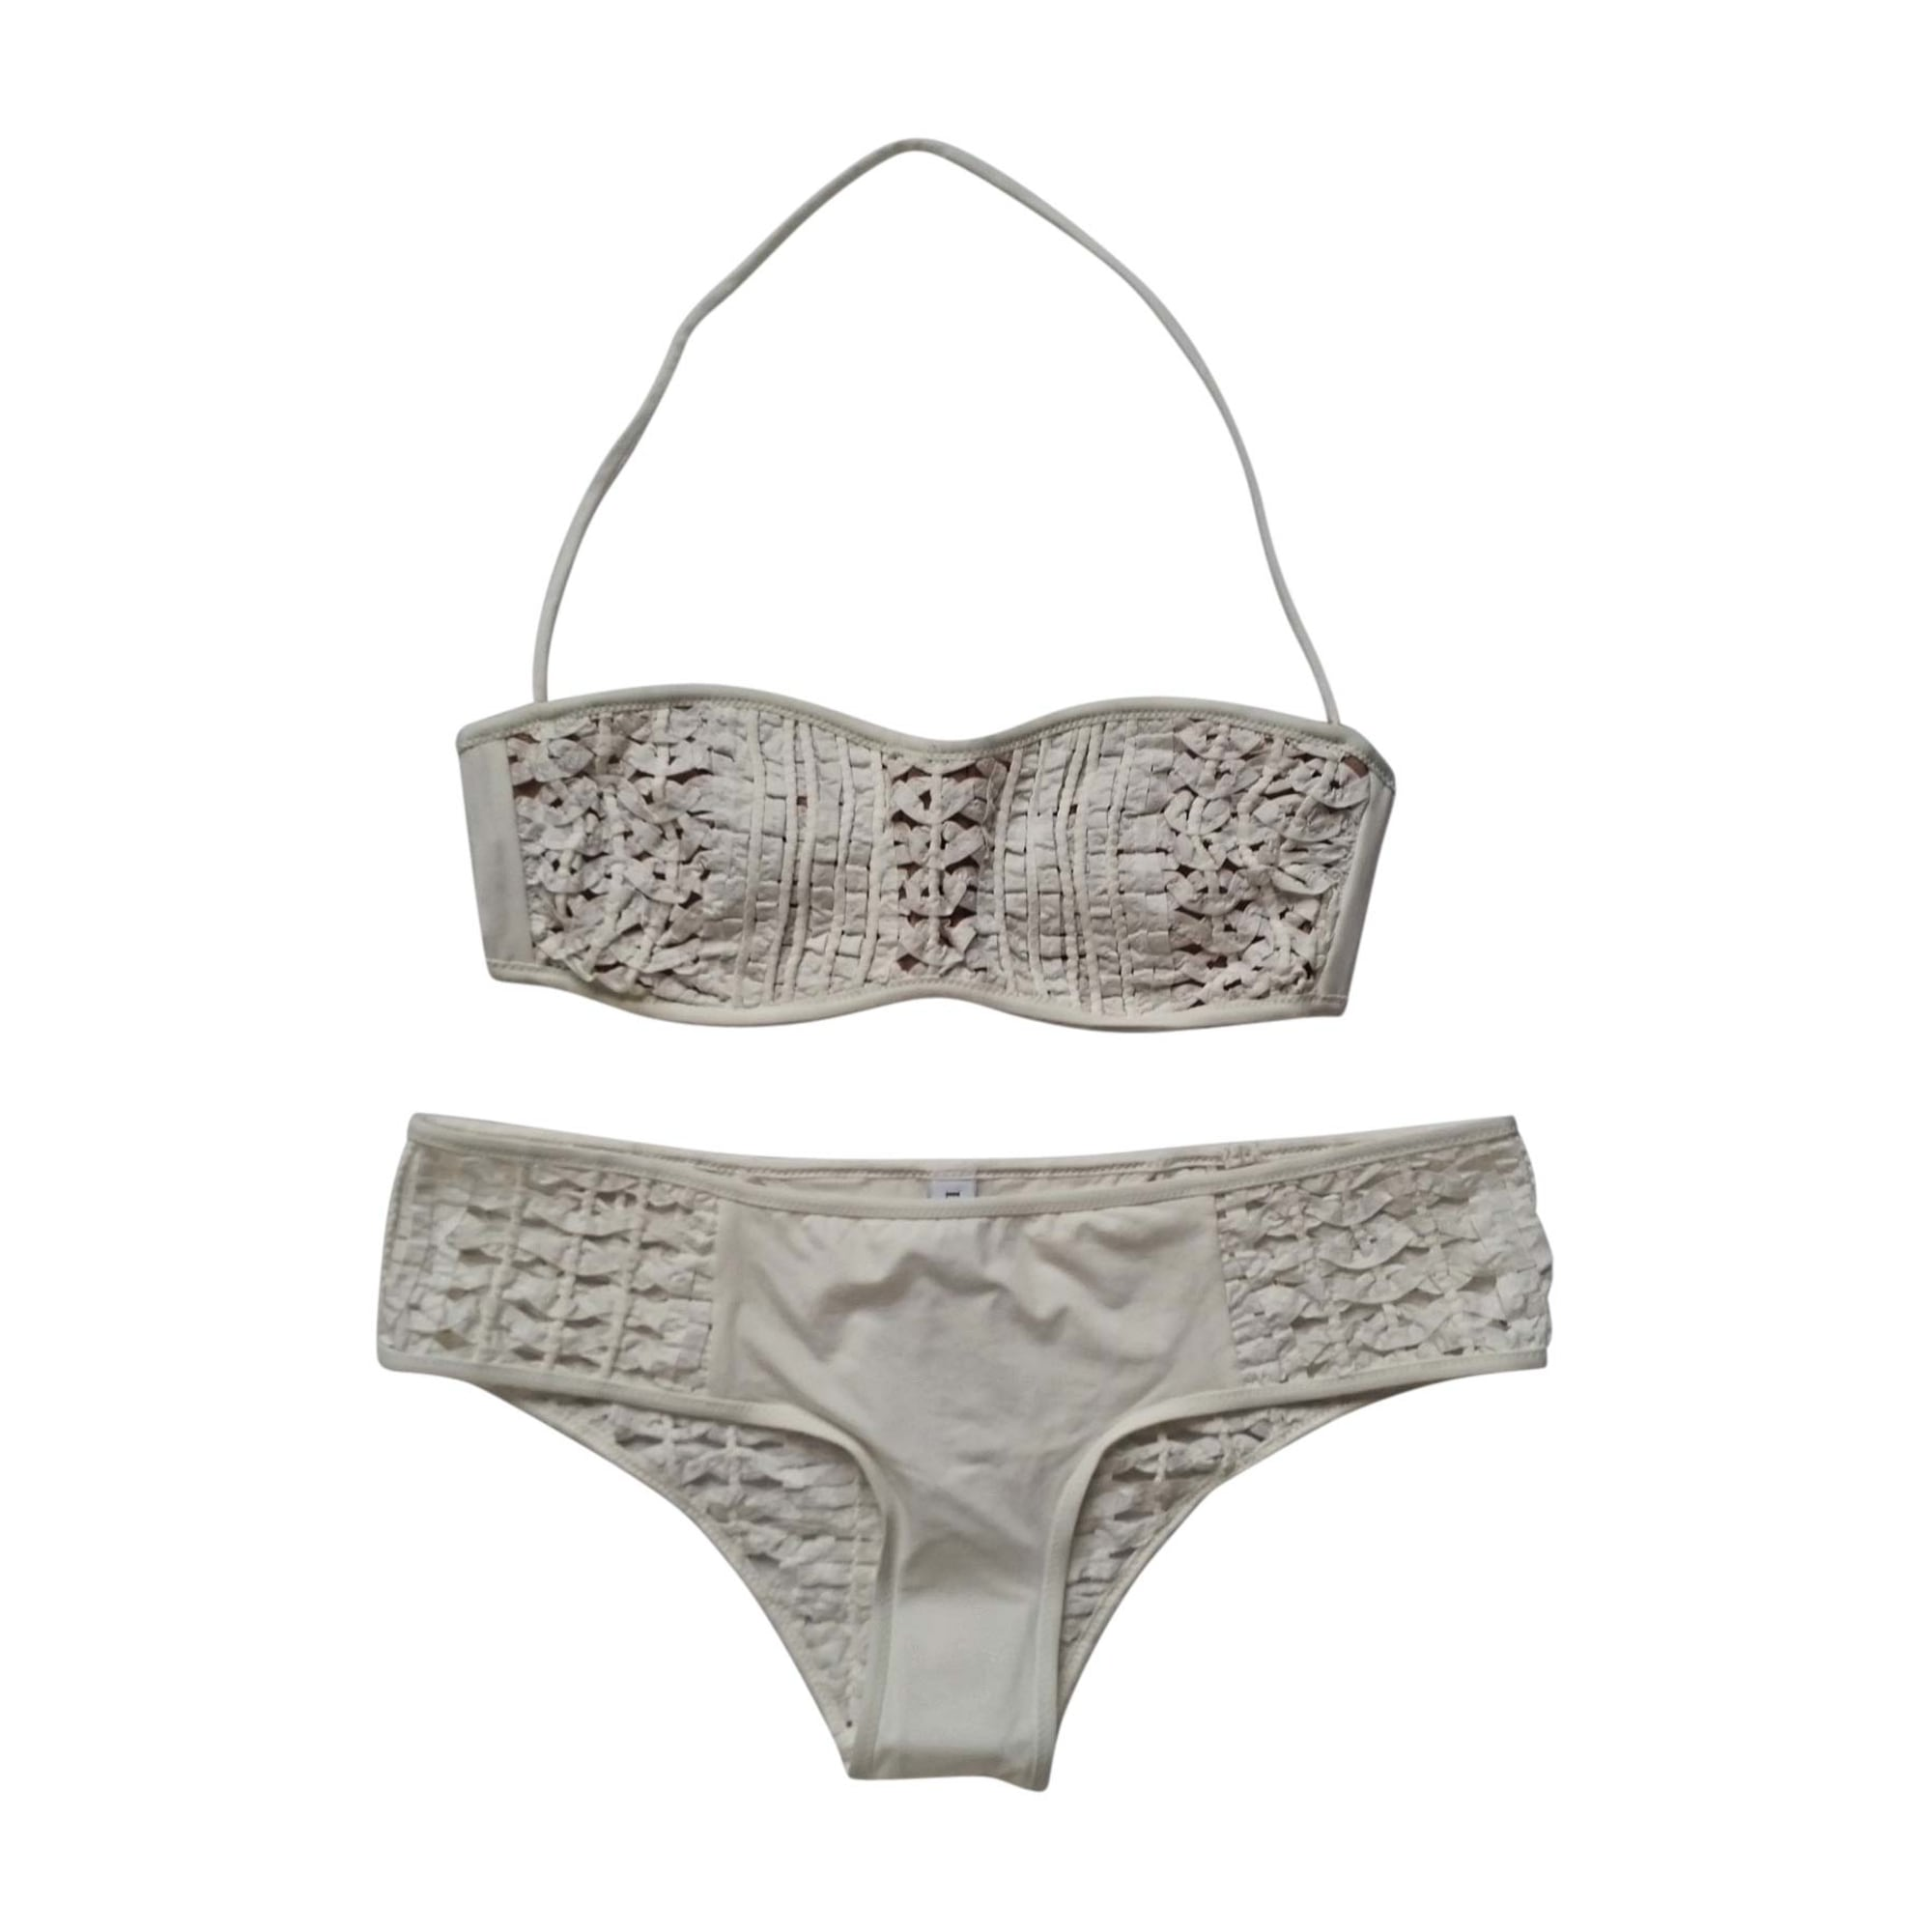 maillot de bain deux pi ces la perla 36 s t1 blanc 7093002. Black Bedroom Furniture Sets. Home Design Ideas